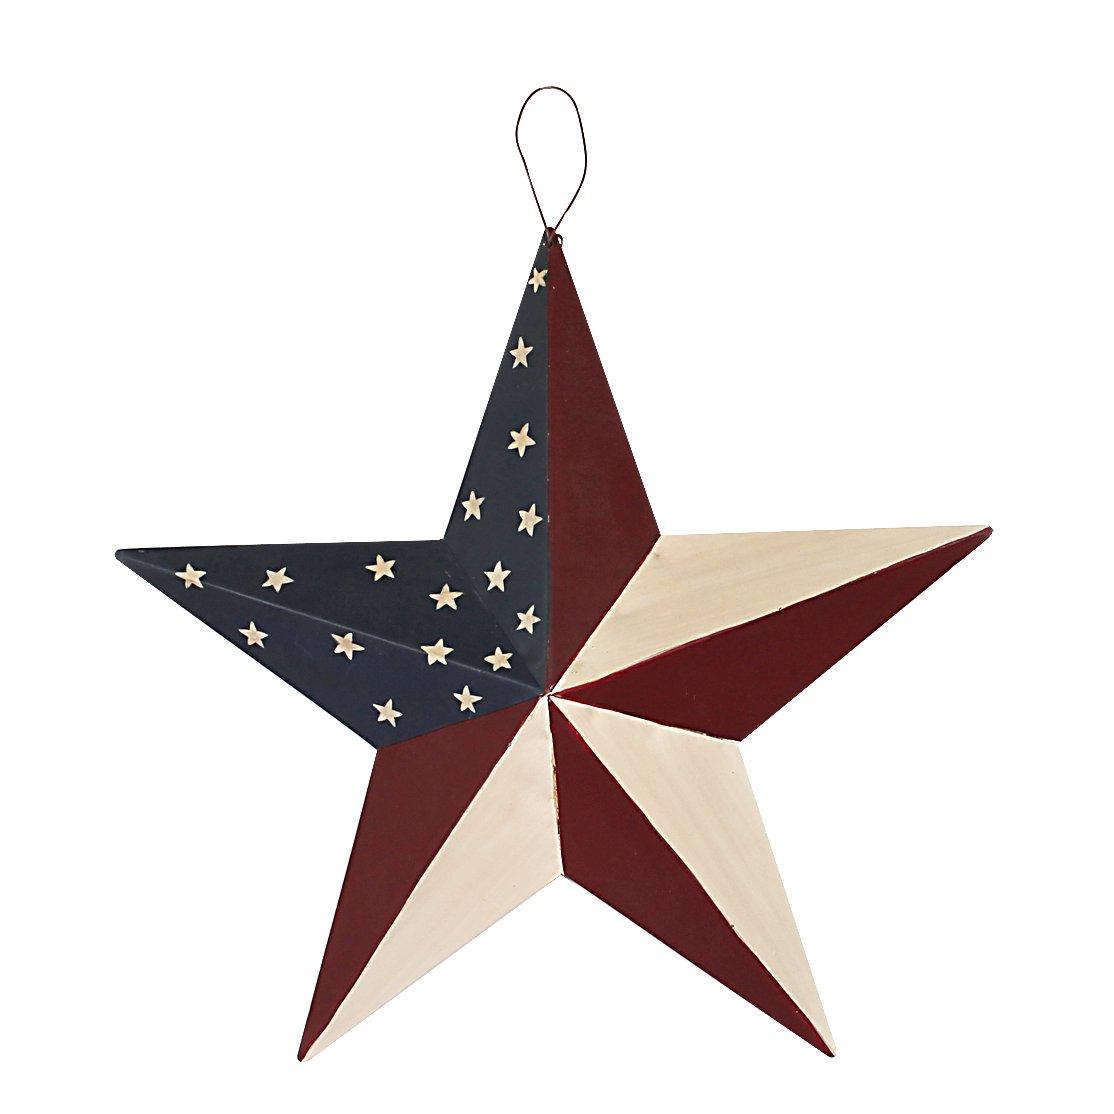 Patriotic Metal Barn Star Outdoor Indoor Hanging Wall Decor Star Ornaments 12inch